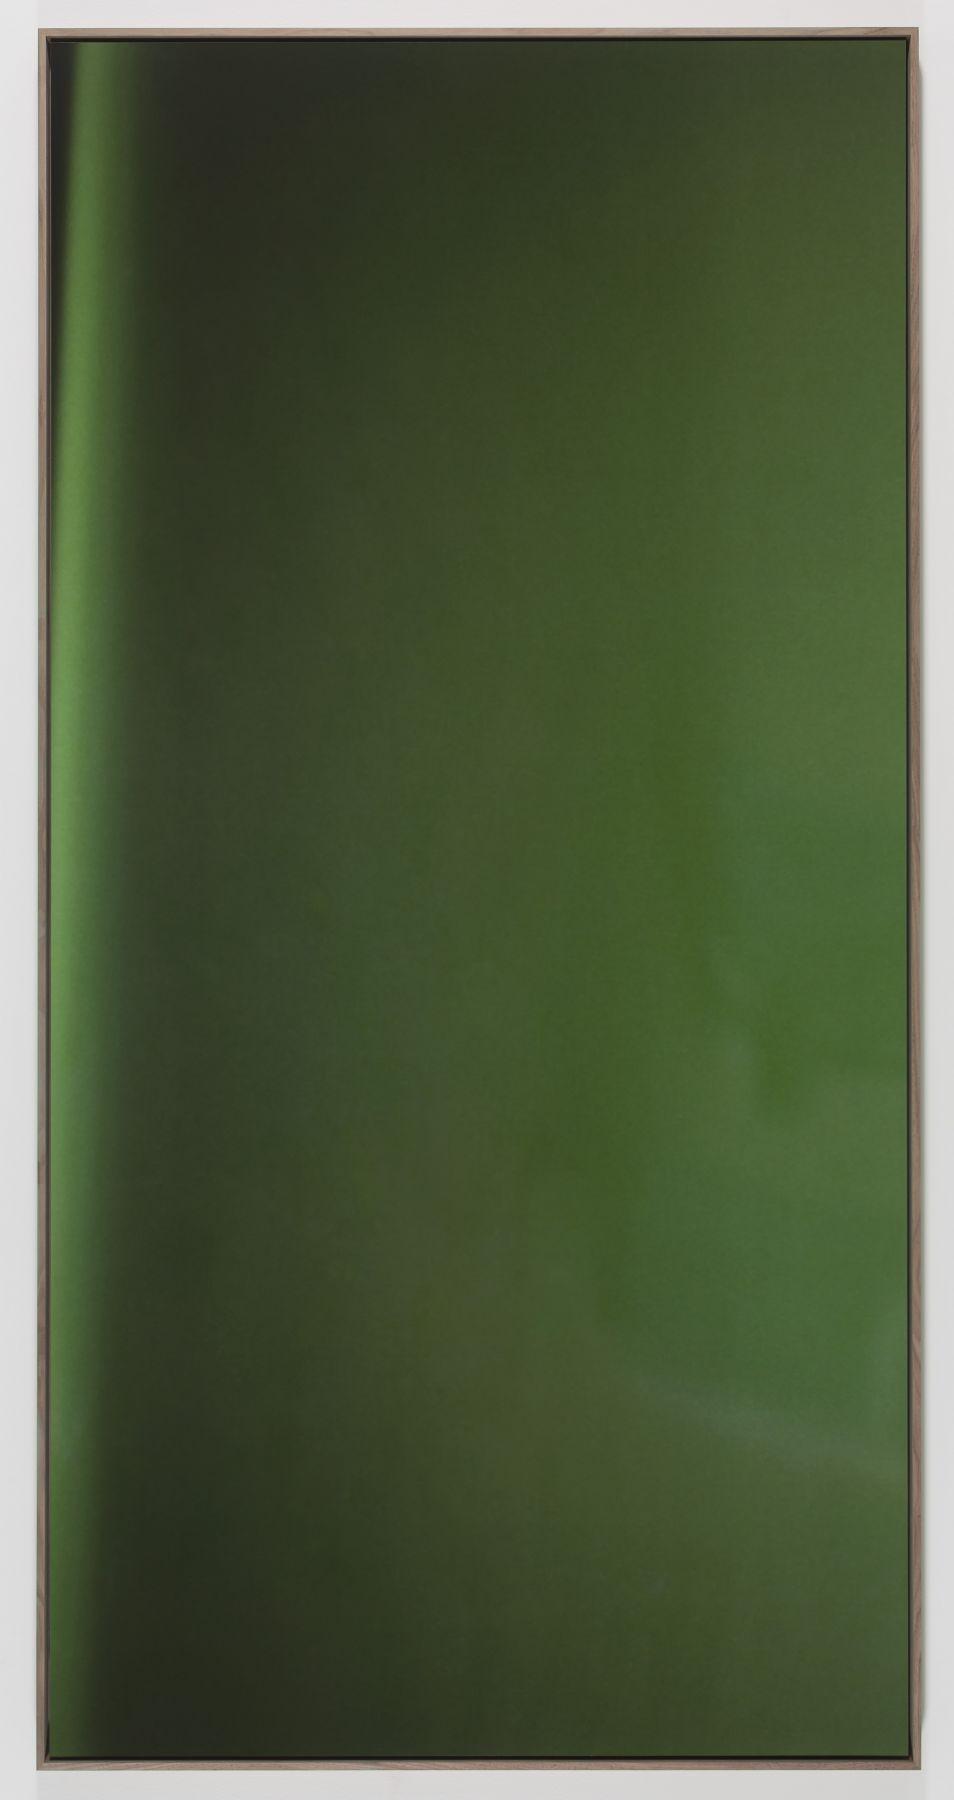 Jan Dibbets New Colorstudies - Moss Green Vertical